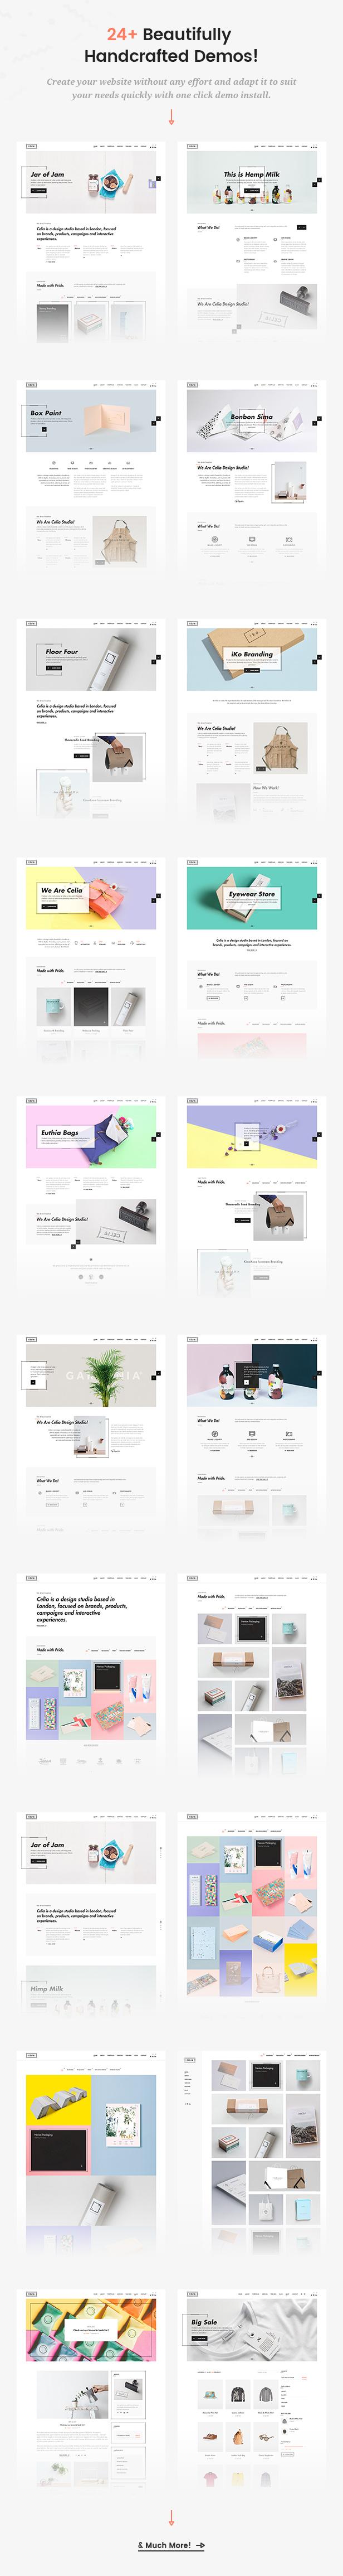 Celia - Innovative and Inspiring Portfolio WordPress Theme for Modern Agencies and Freelancers - 2